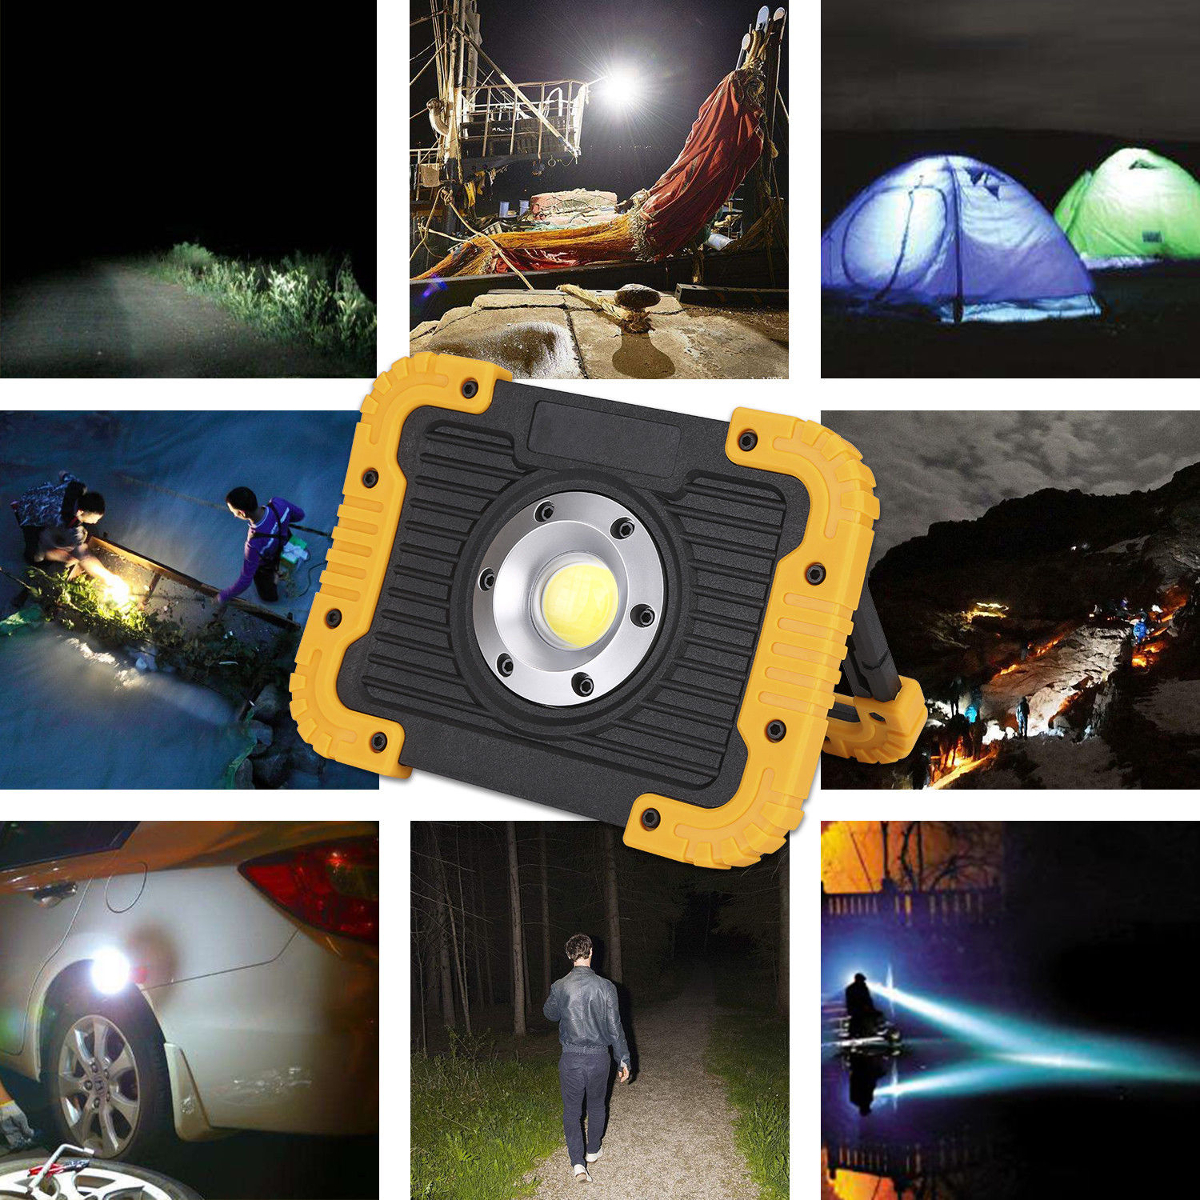 Outdoor Camping 750lm COB Tent Light USB Rechargeable Power Bank Work Maintenance Light